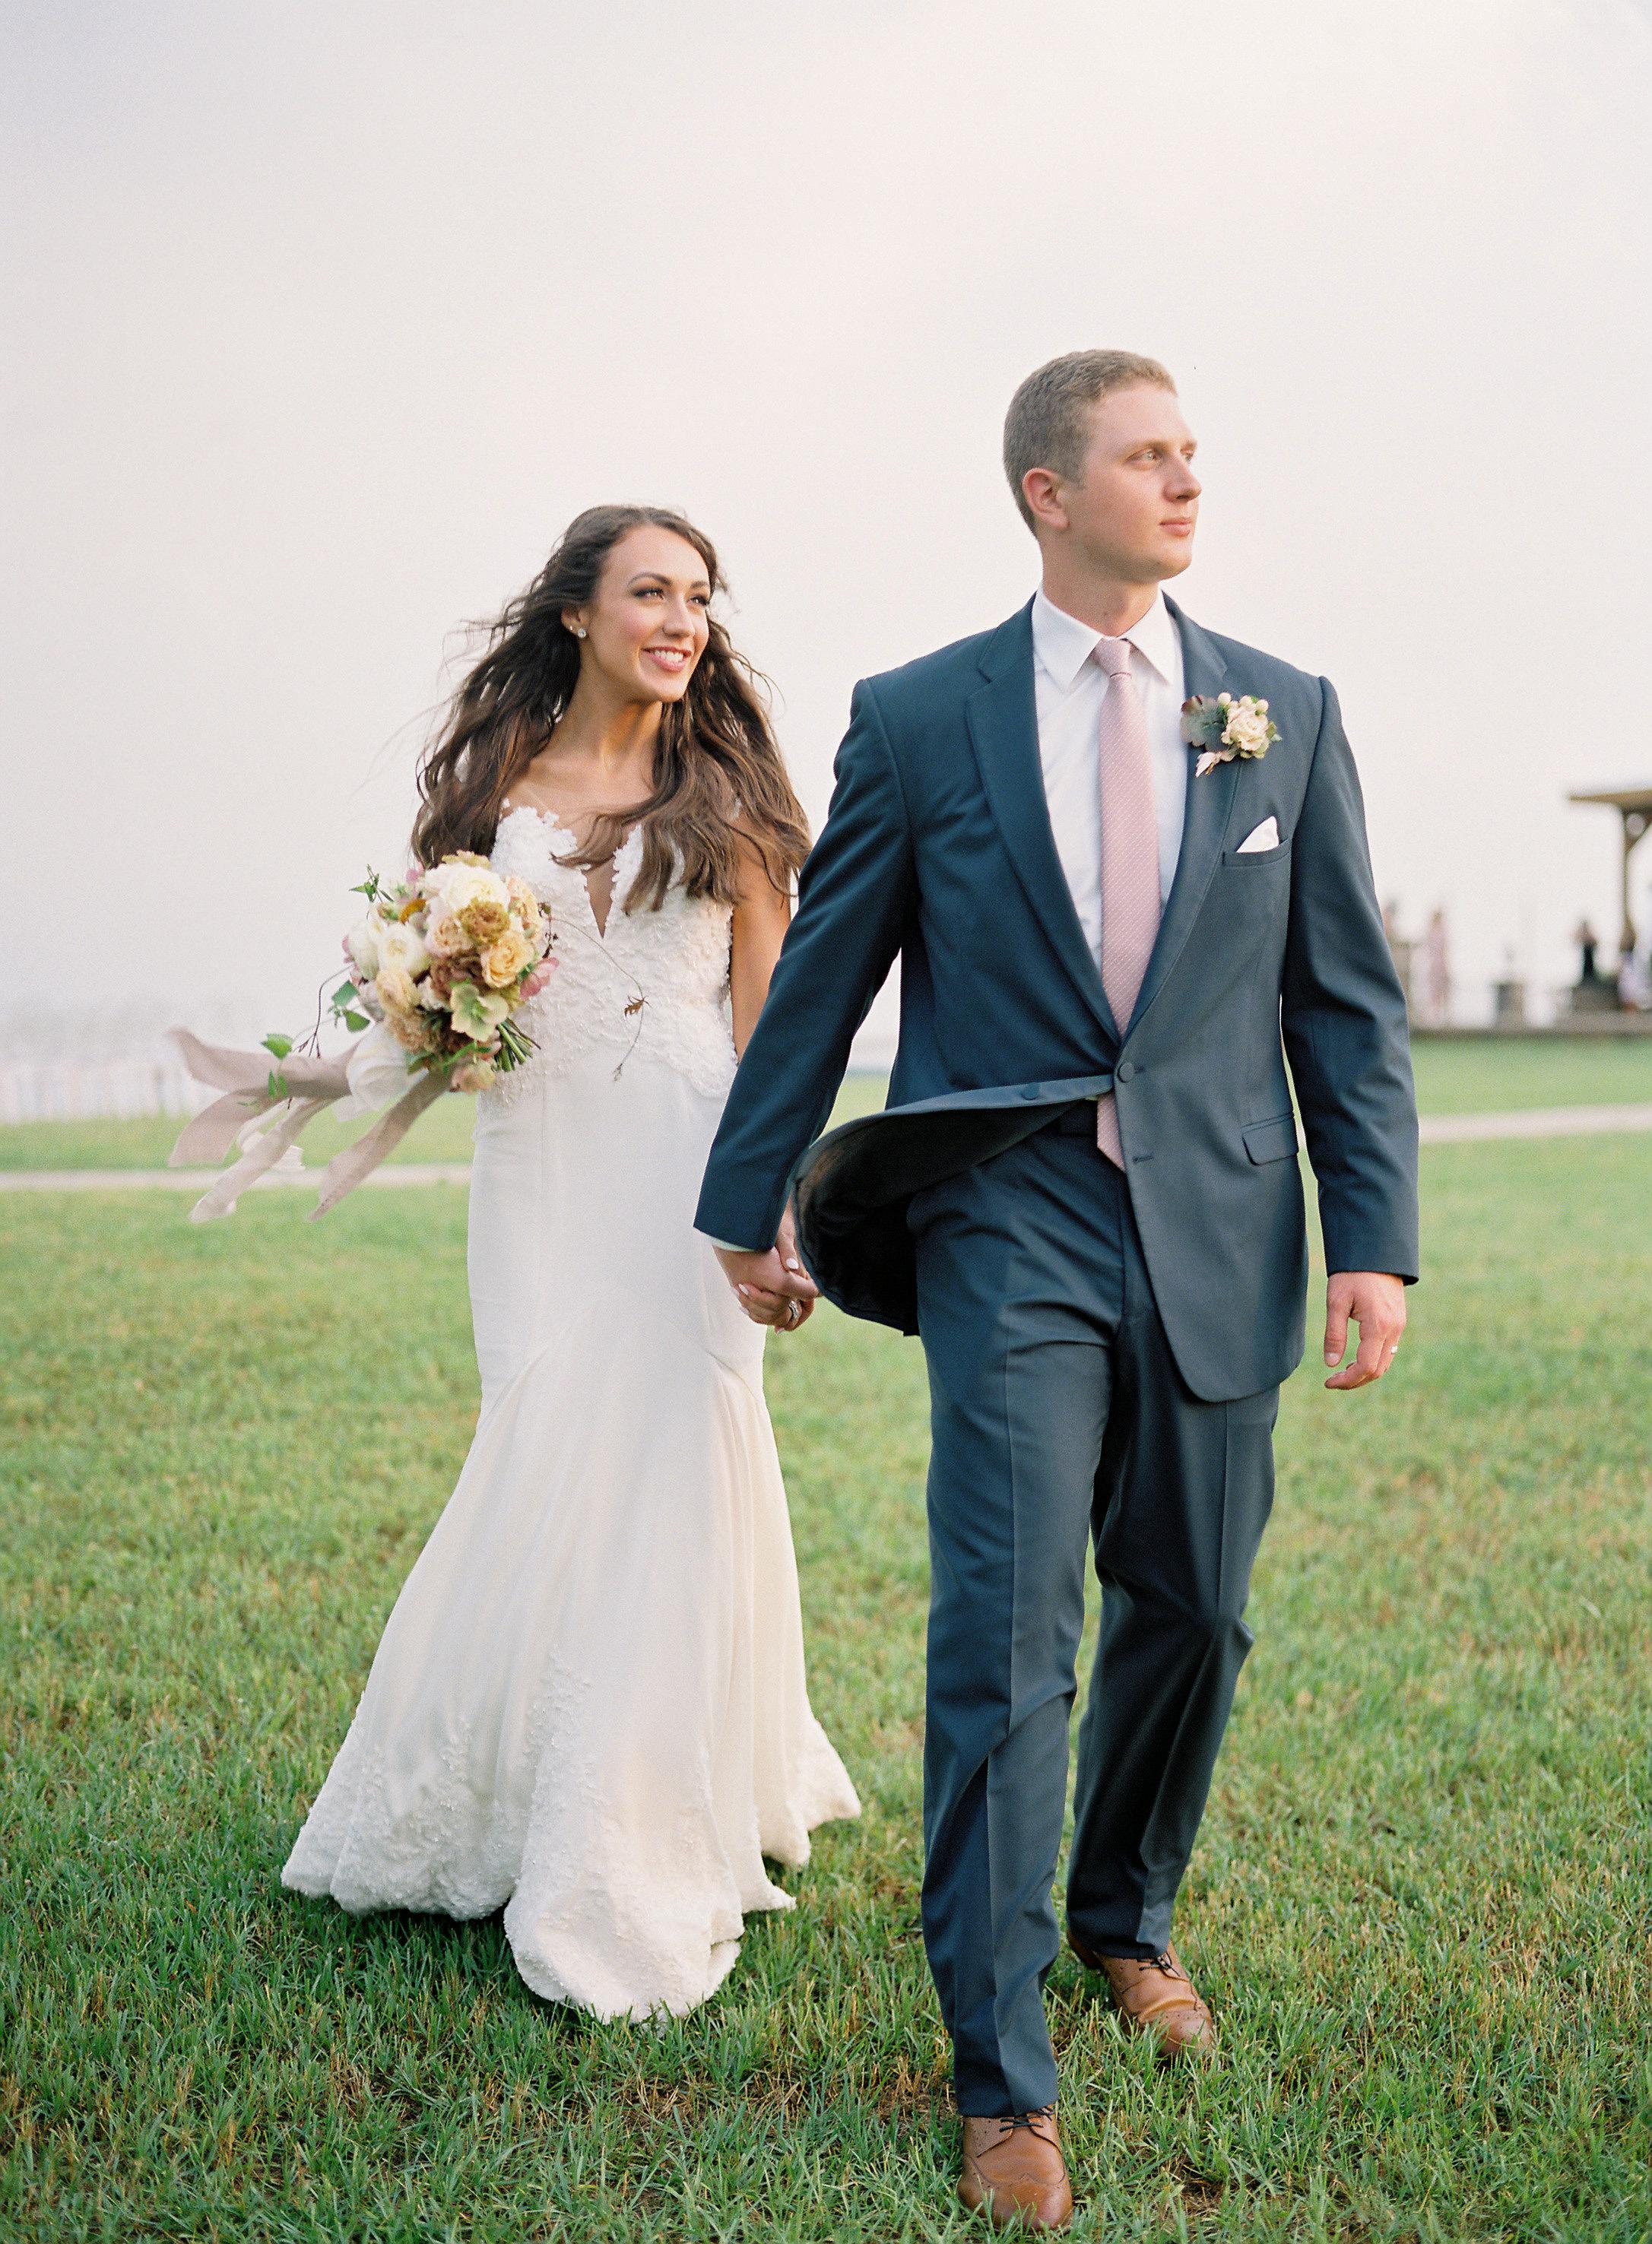 wedding couple walk outdoors holding hands